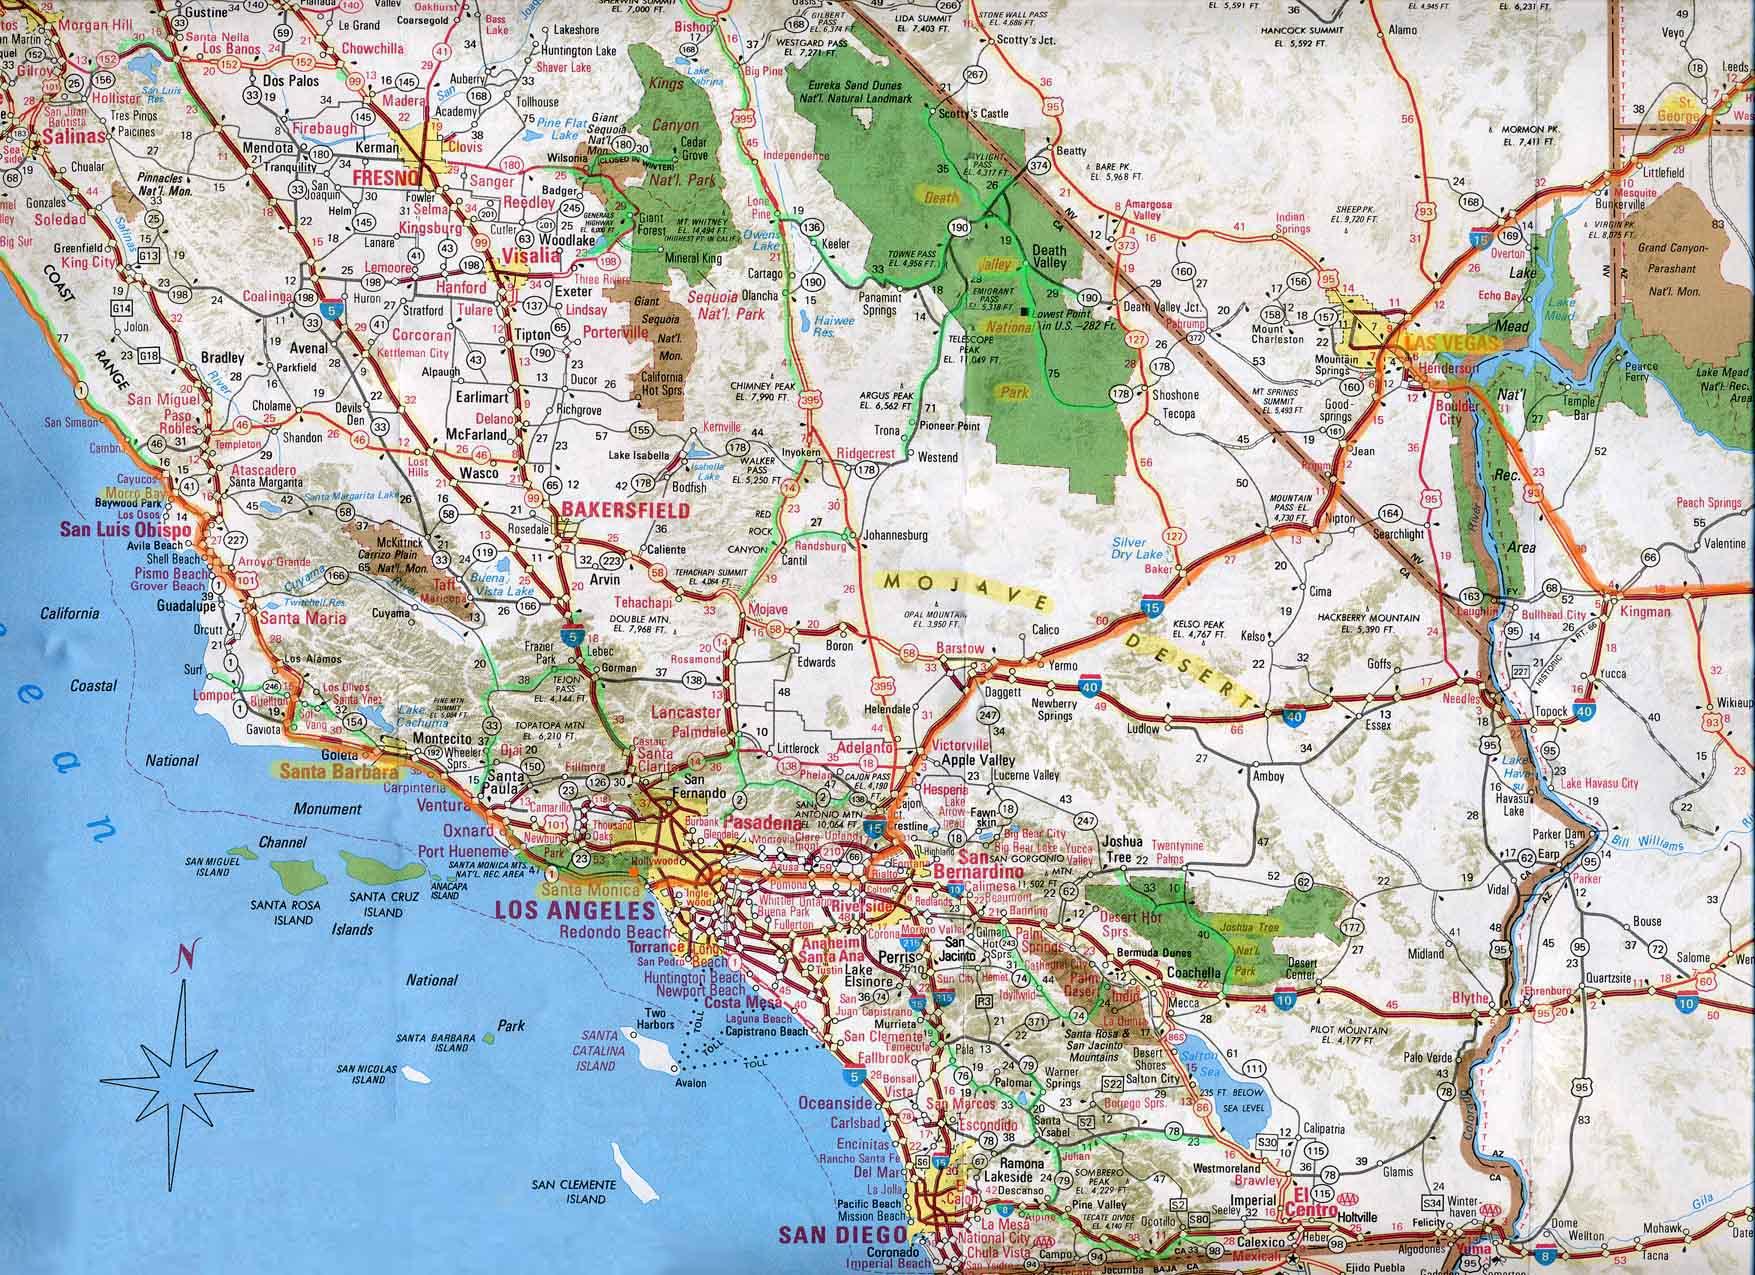 Southern California Map From Kolovrat 5 - Ameliabd - Map Of Southern California